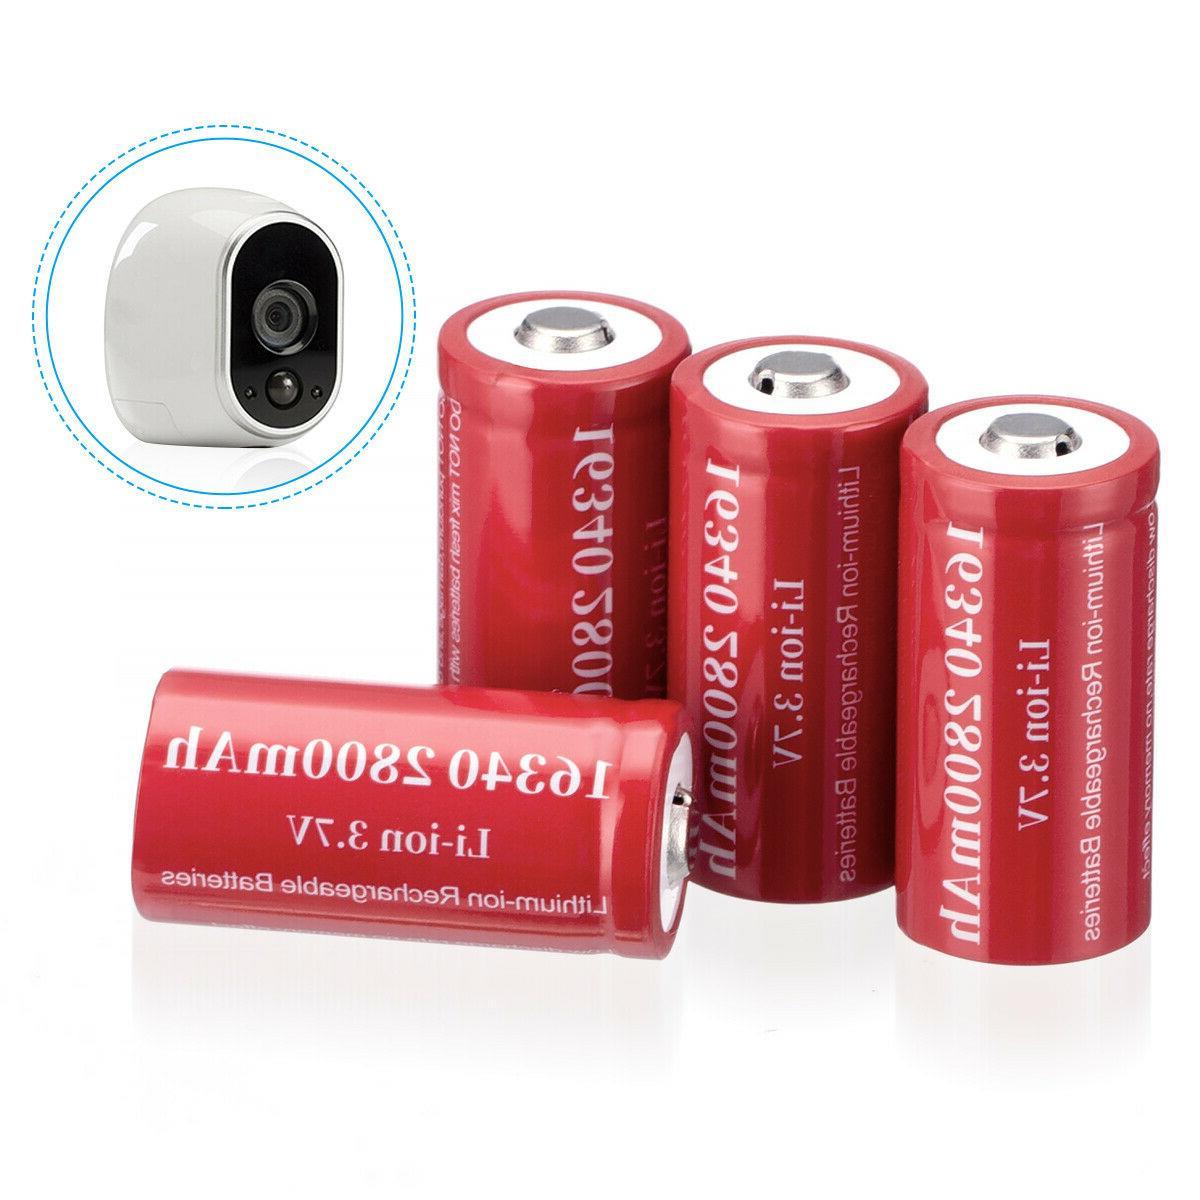 2800mAh Batteries CR123A Rechargeable Li-ion / Smart Charger Lot